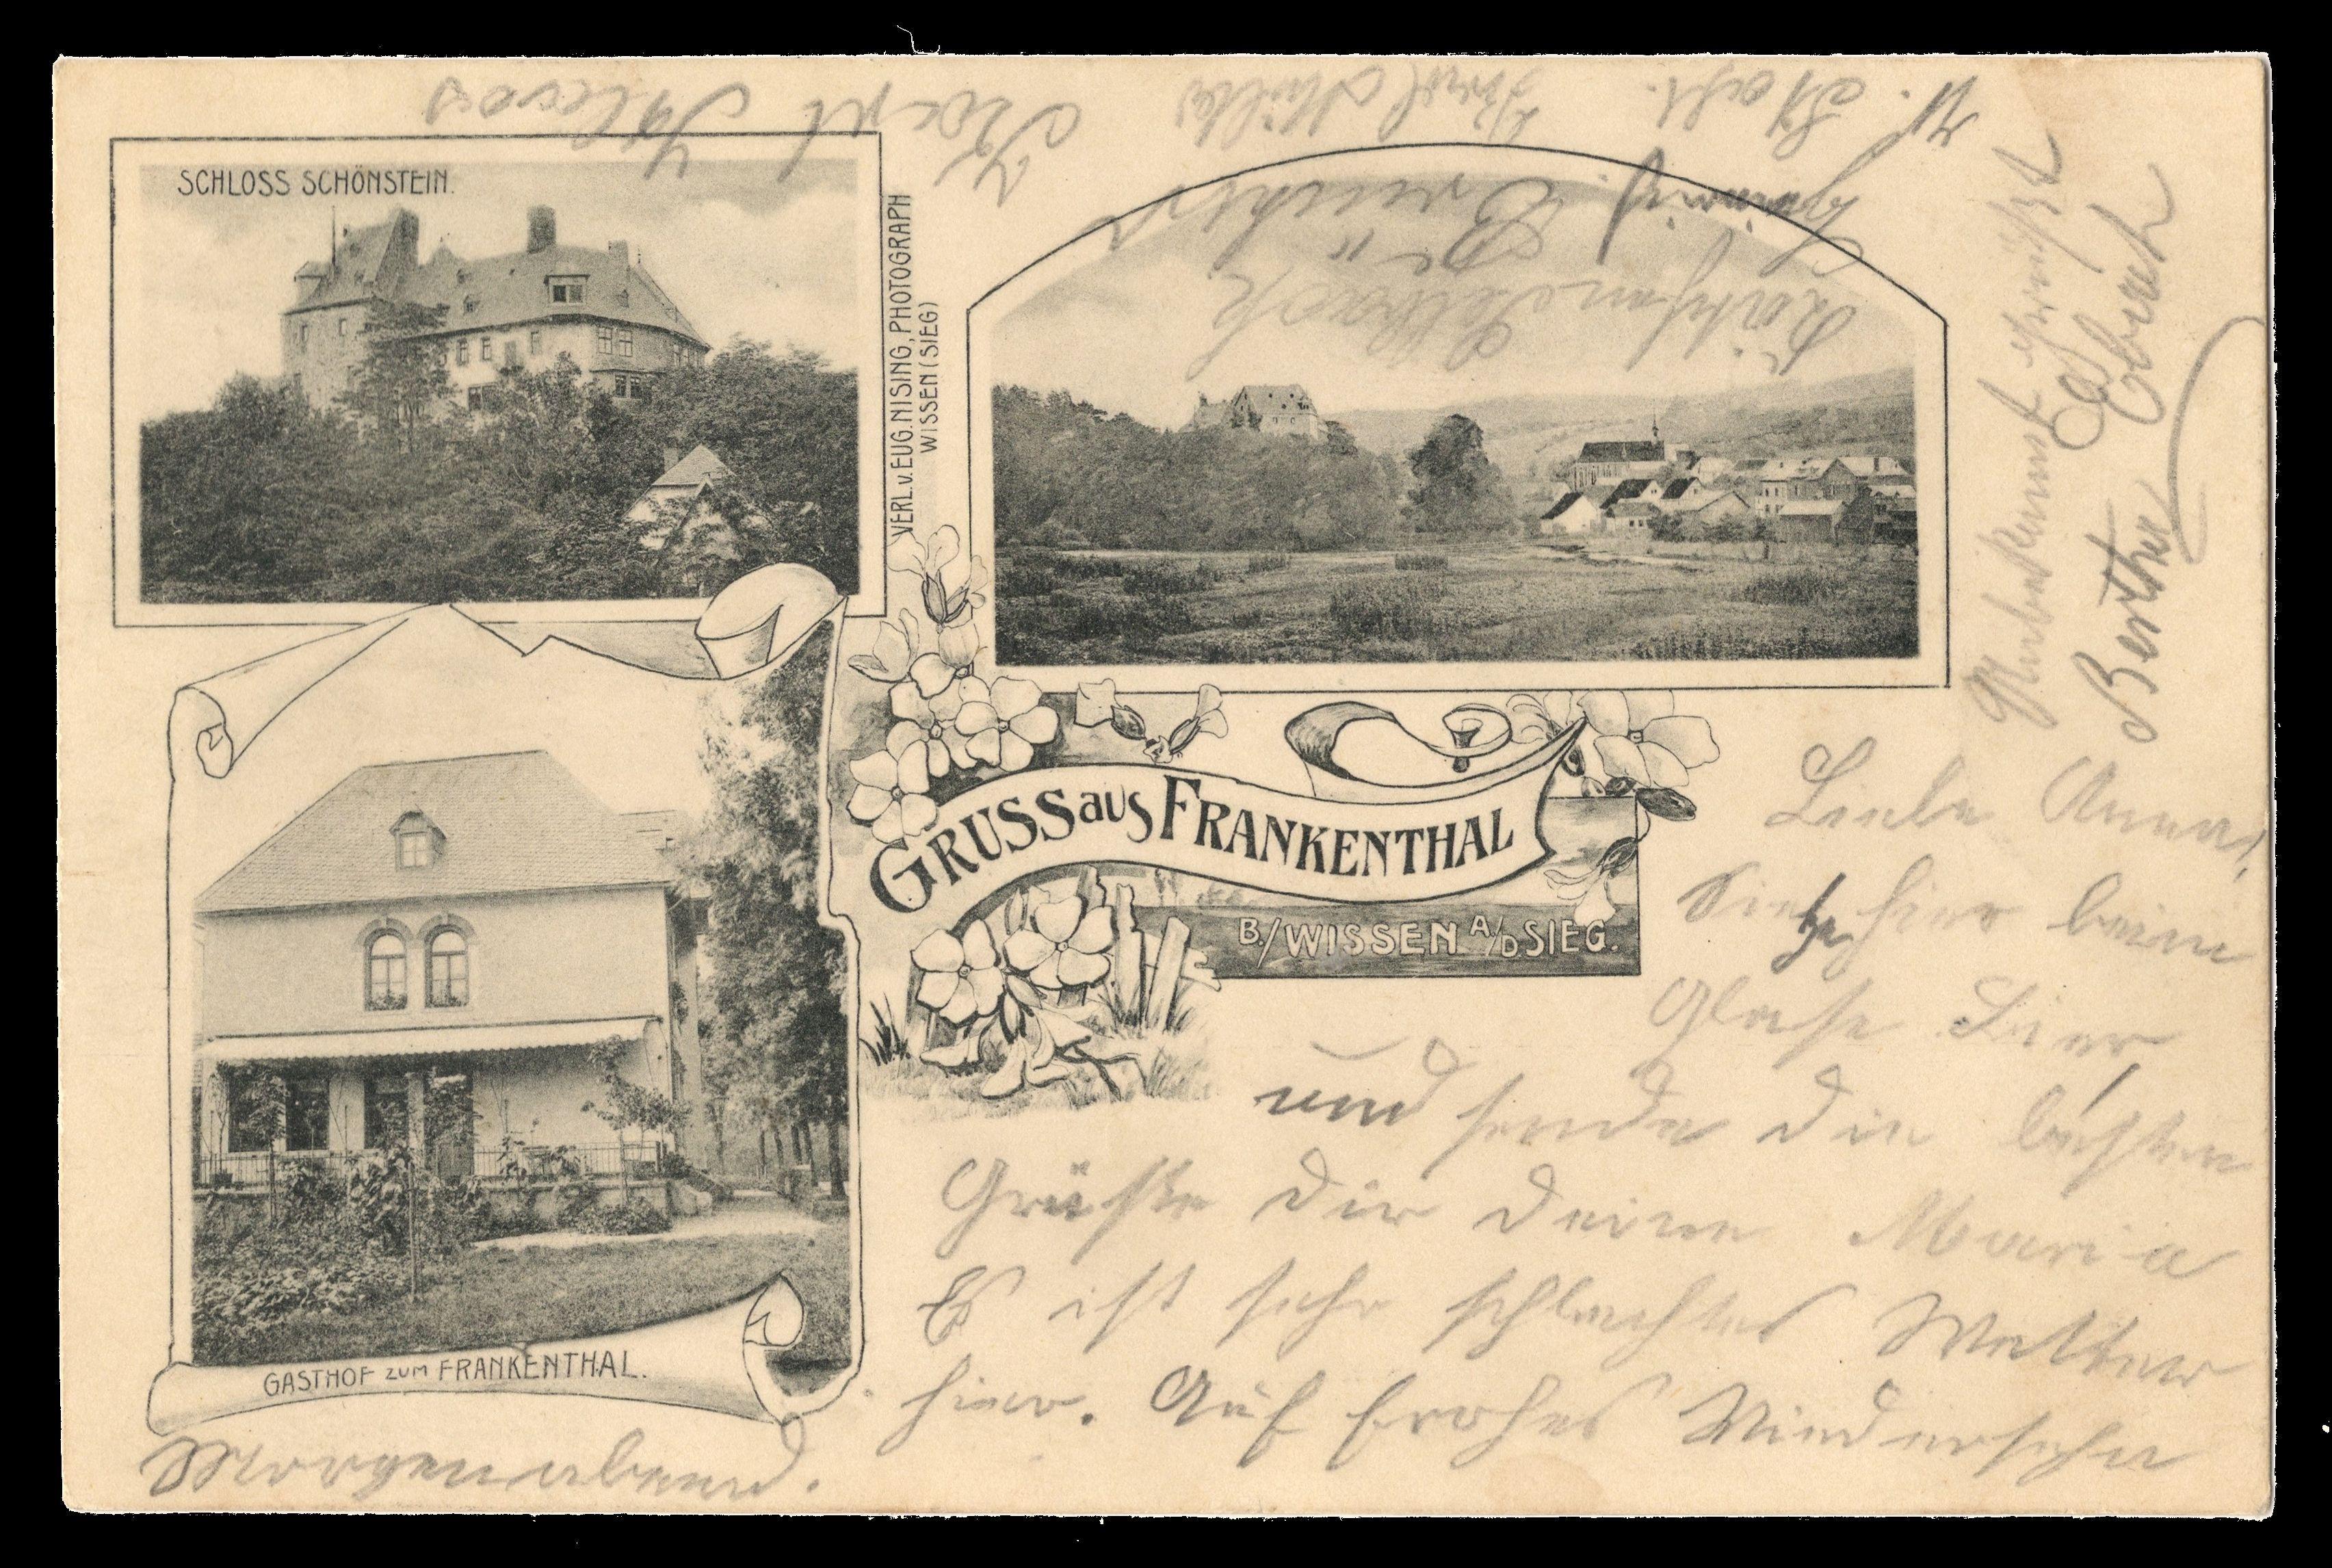 1903 Frankenthal Gasthof Zum Frankenthal Gel 1903 Jmw